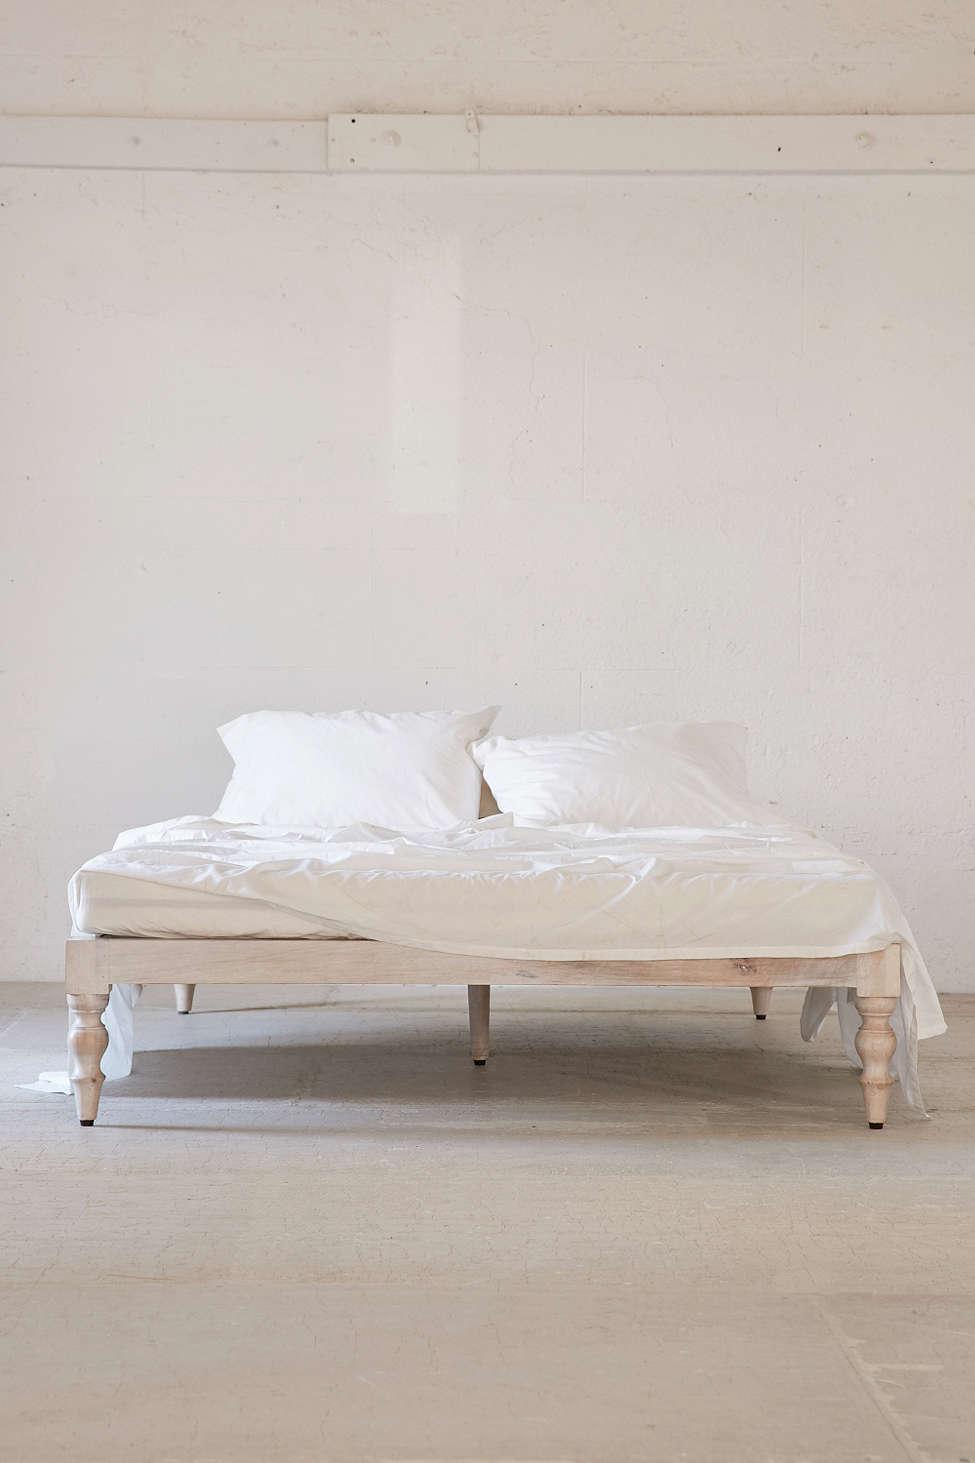 Stuff your stuff platform bed - Free Shipping 50